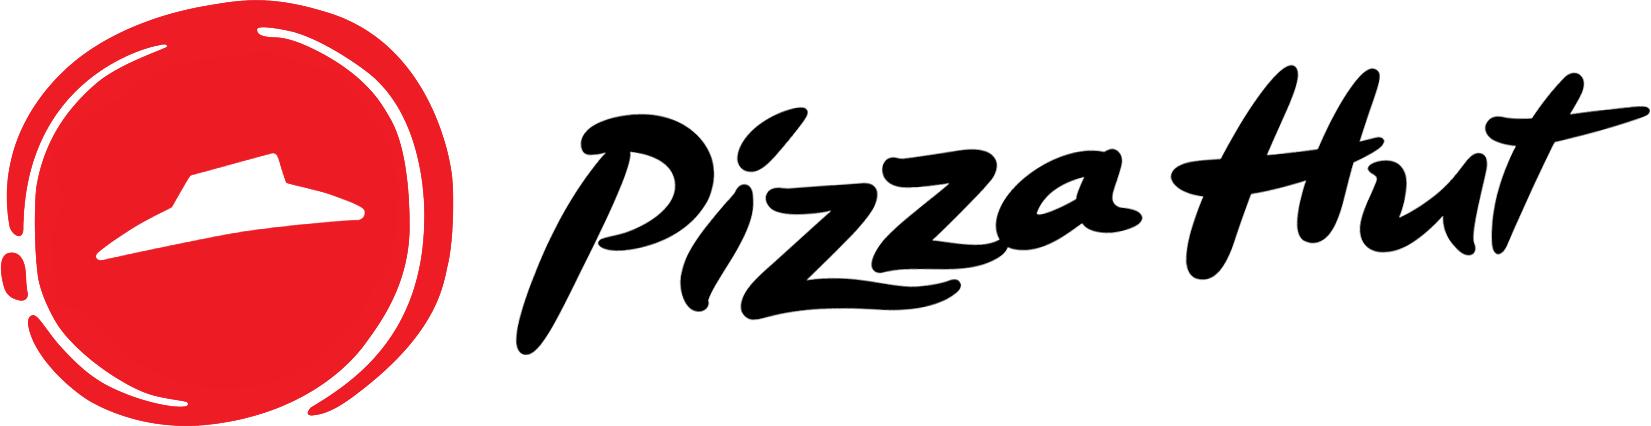 Pizza Hut: 2 Medium 2 Topping Pizza - $5.99